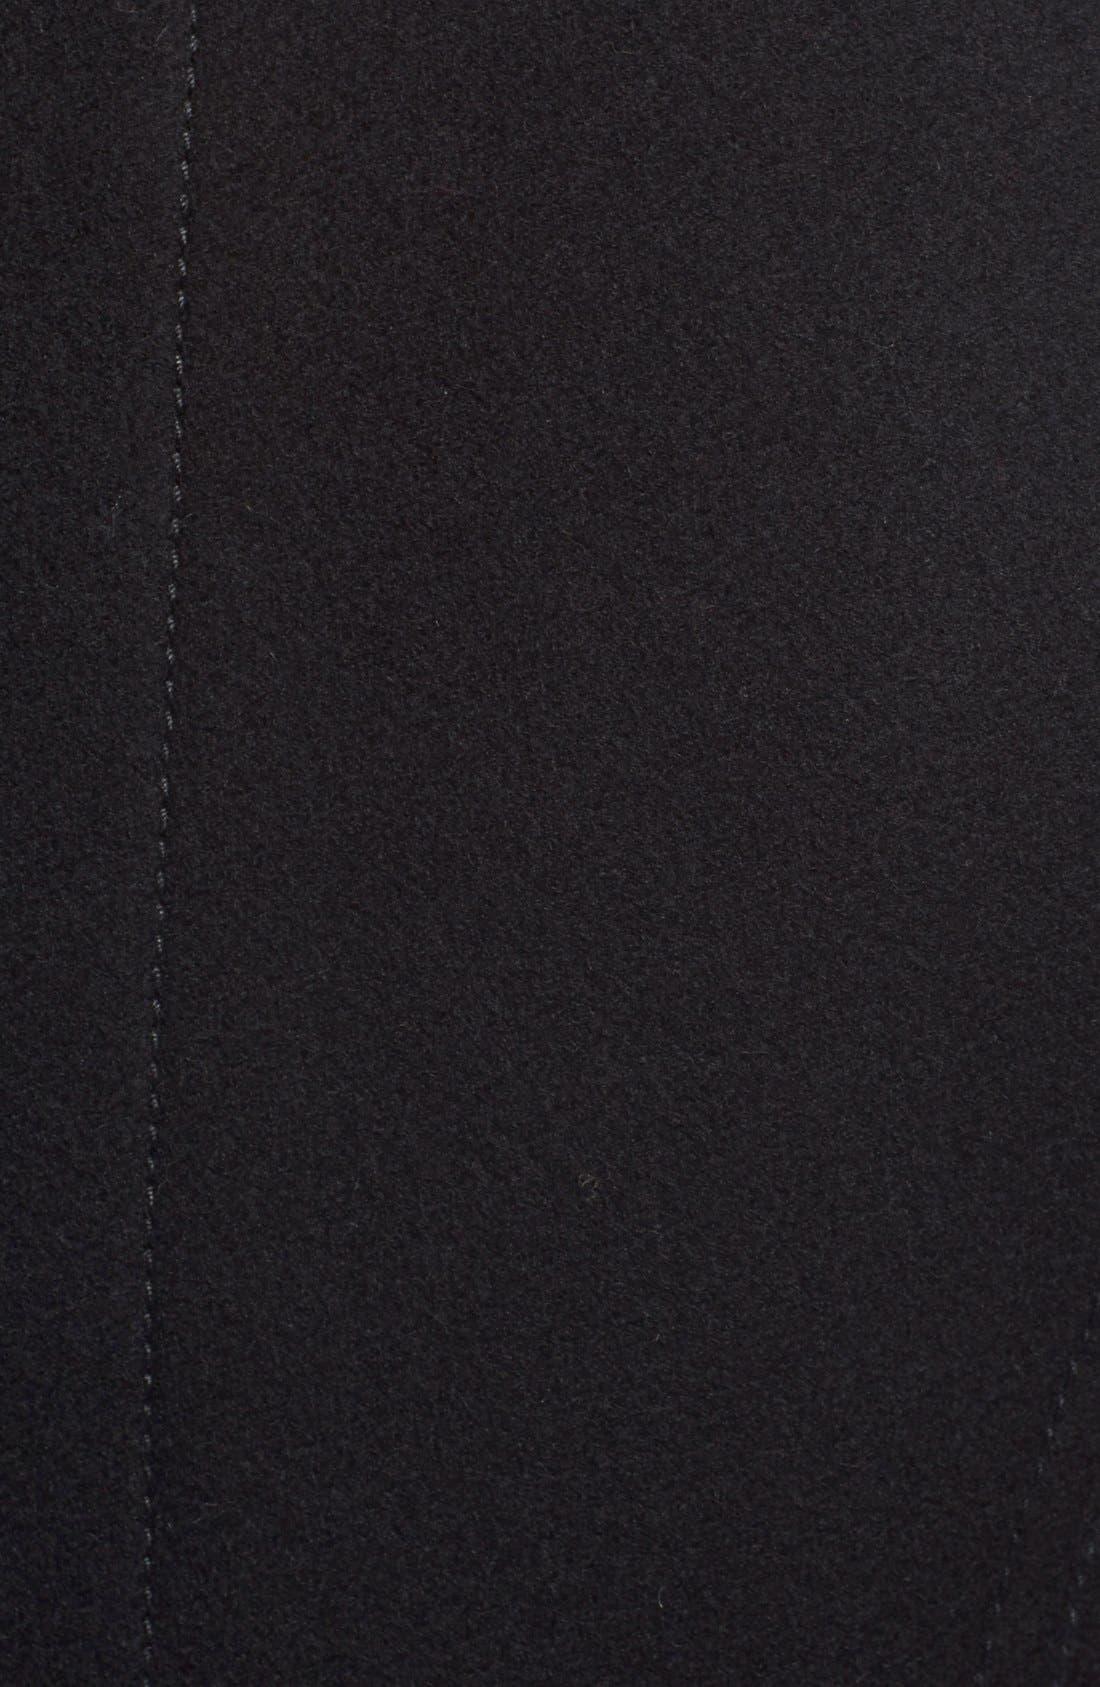 BURBERRY BRIT,                             BuberryBrit 'Milbury' Wool Blend Jacket,                             Alternate thumbnail 2, color,                             001